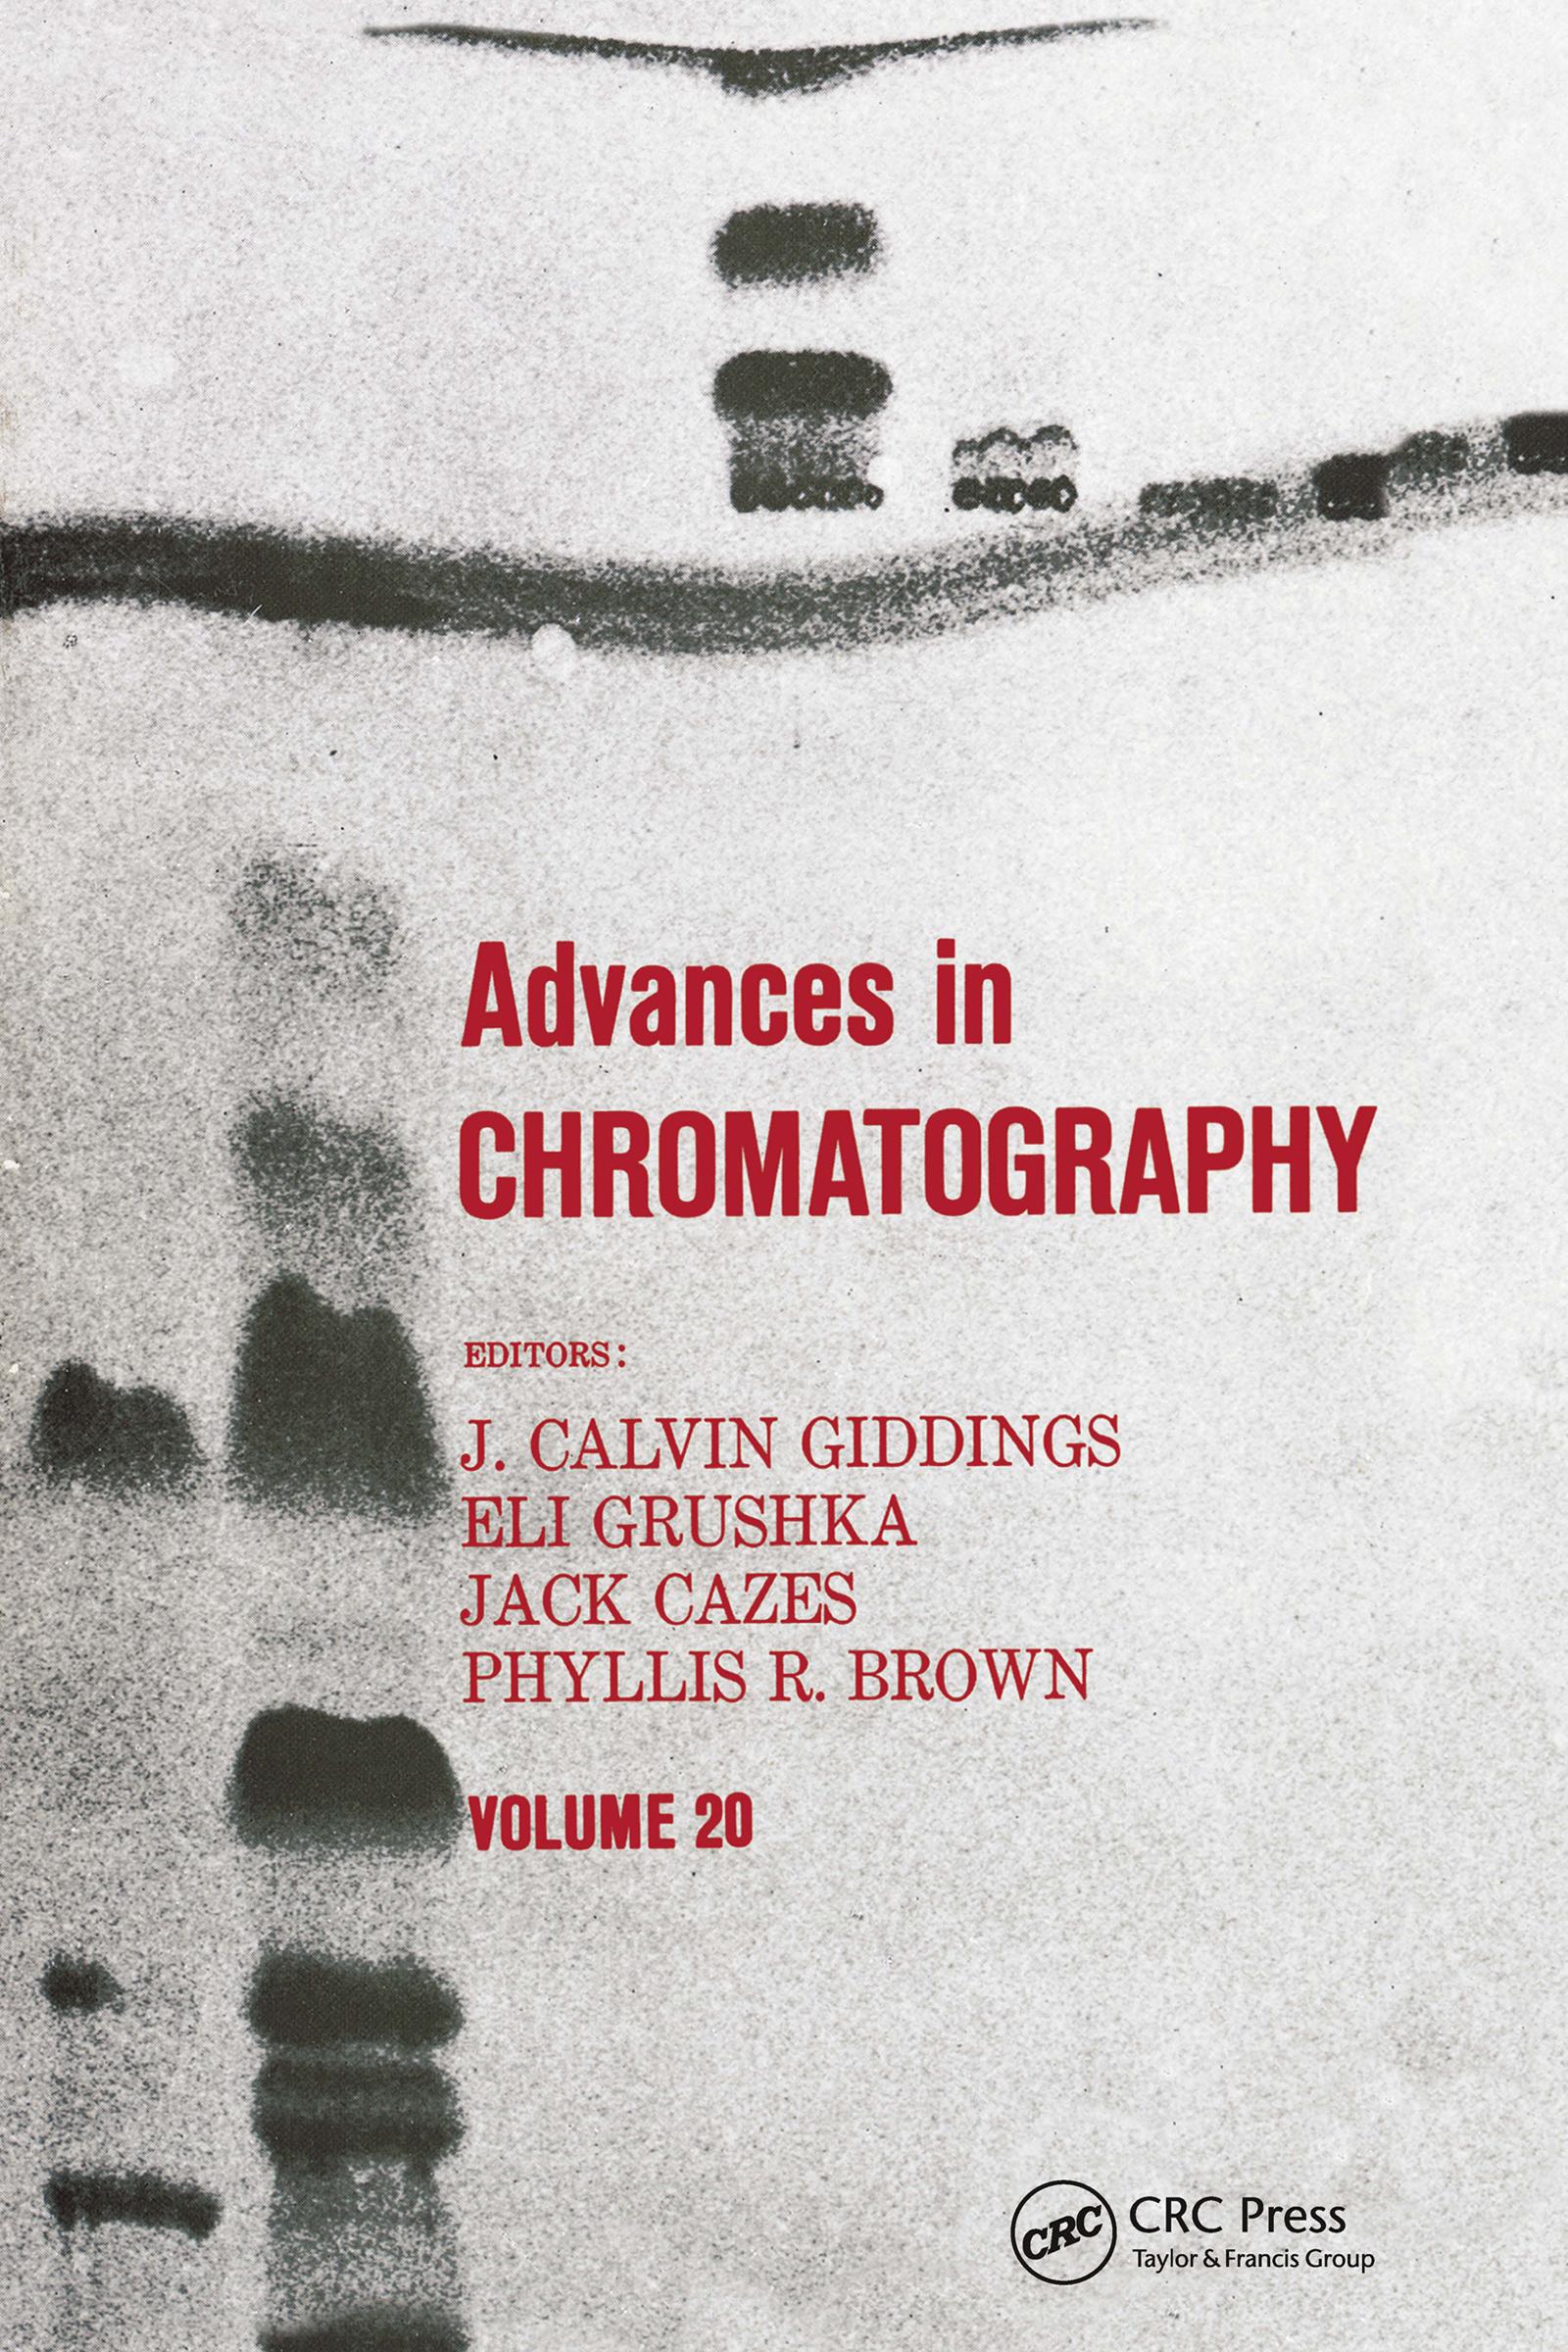 Advances in Chromatography: Volume 20 book cover